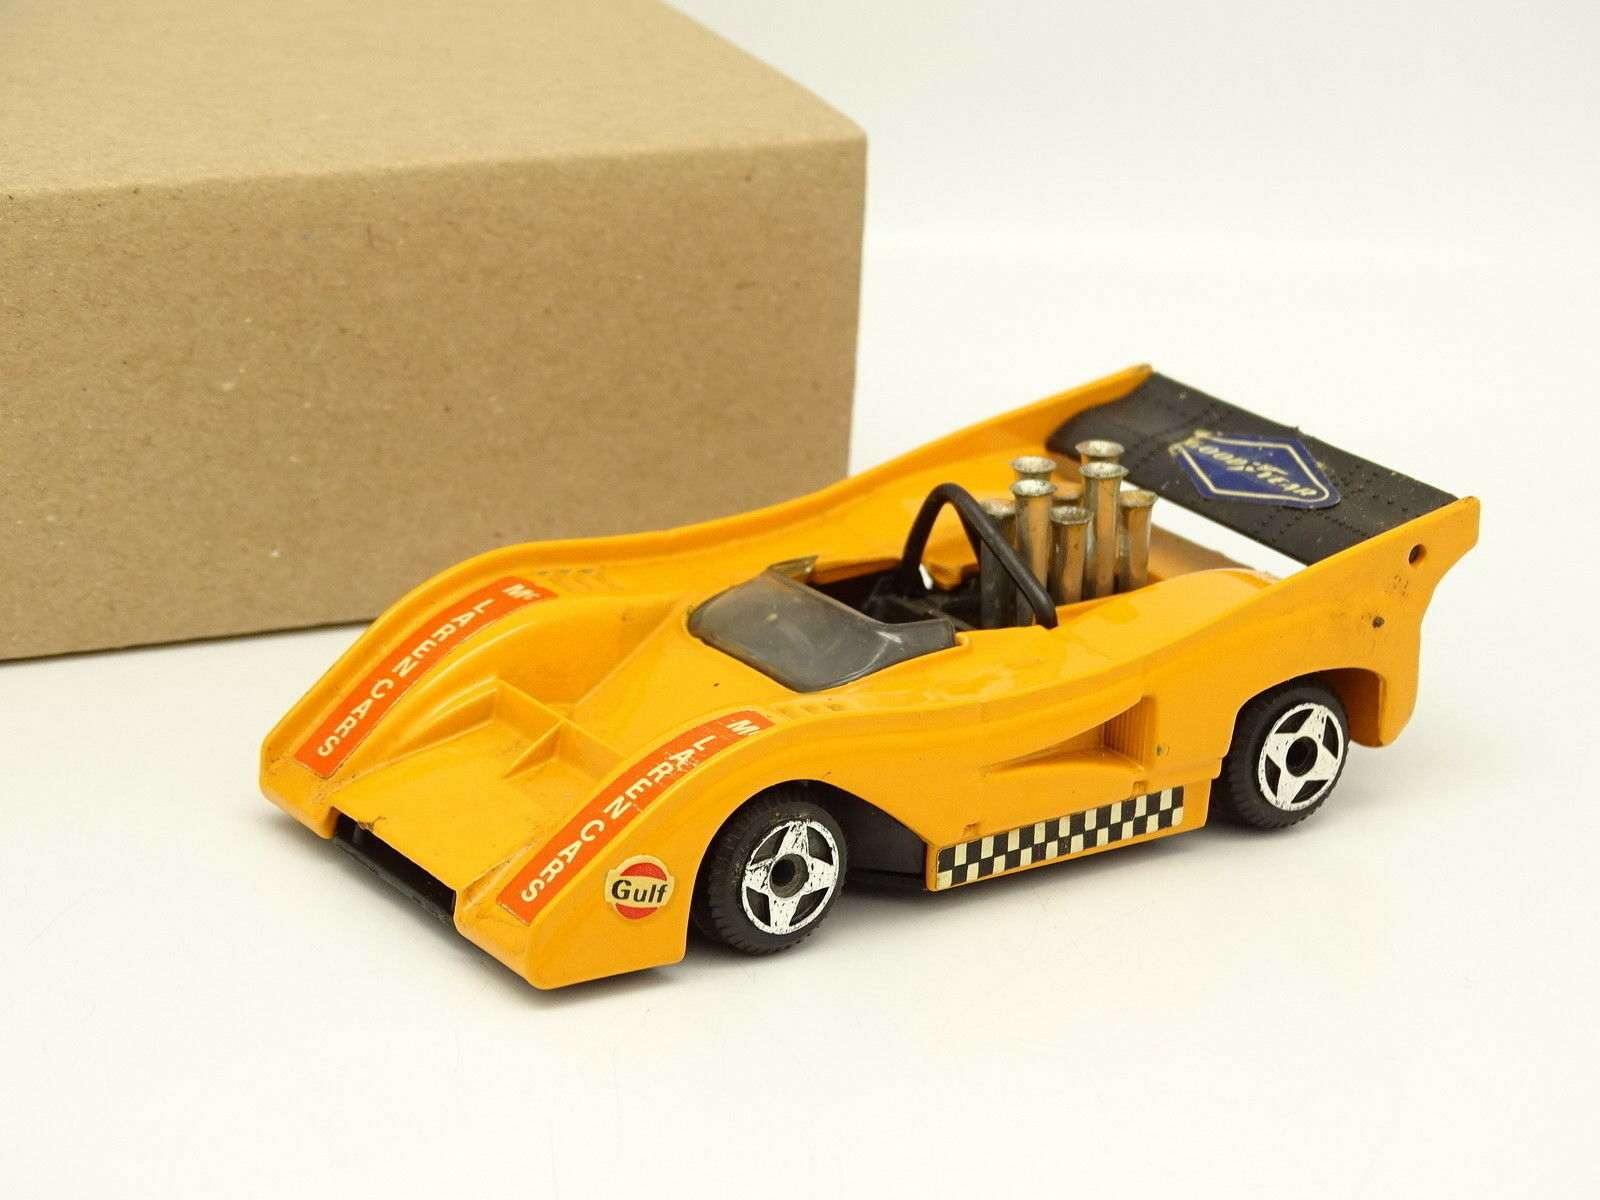 Politoys 1 43 McLaren Chevrolet m8f can am